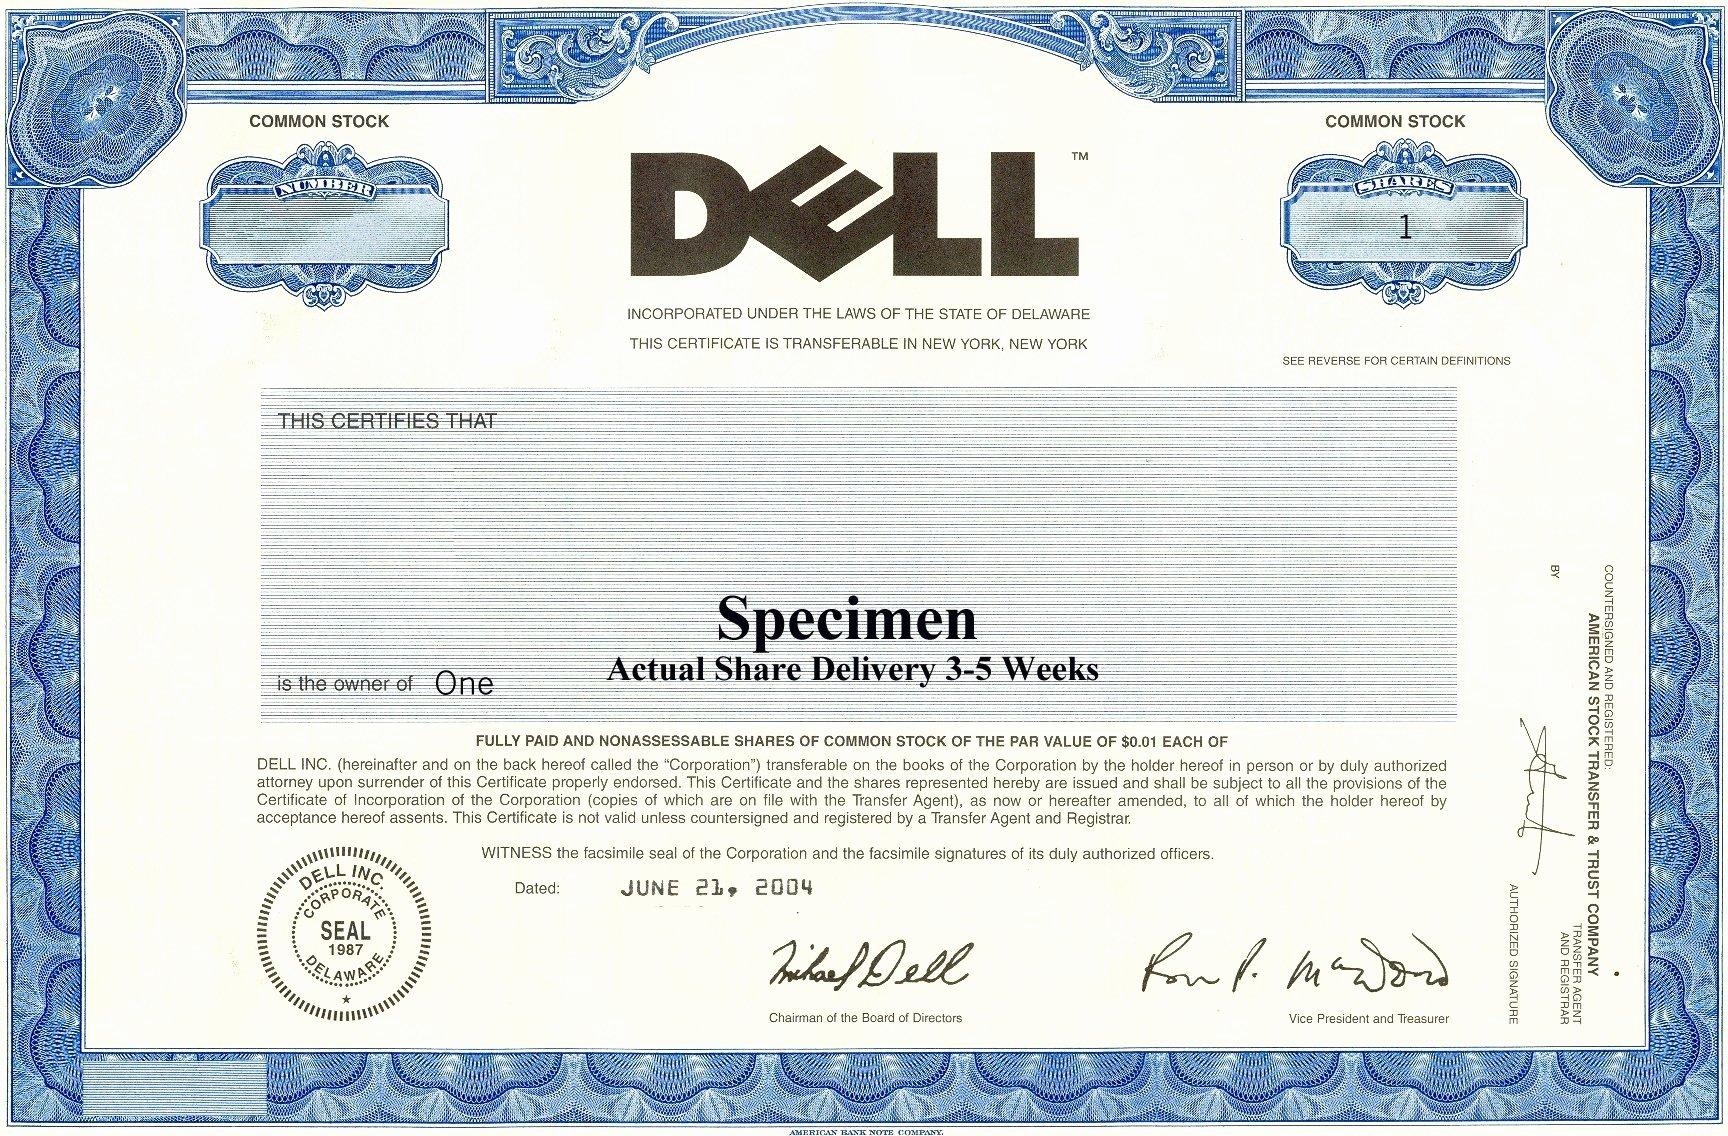 Corporate Bond Certificate Template Unique Corporate Bond Certificate Template